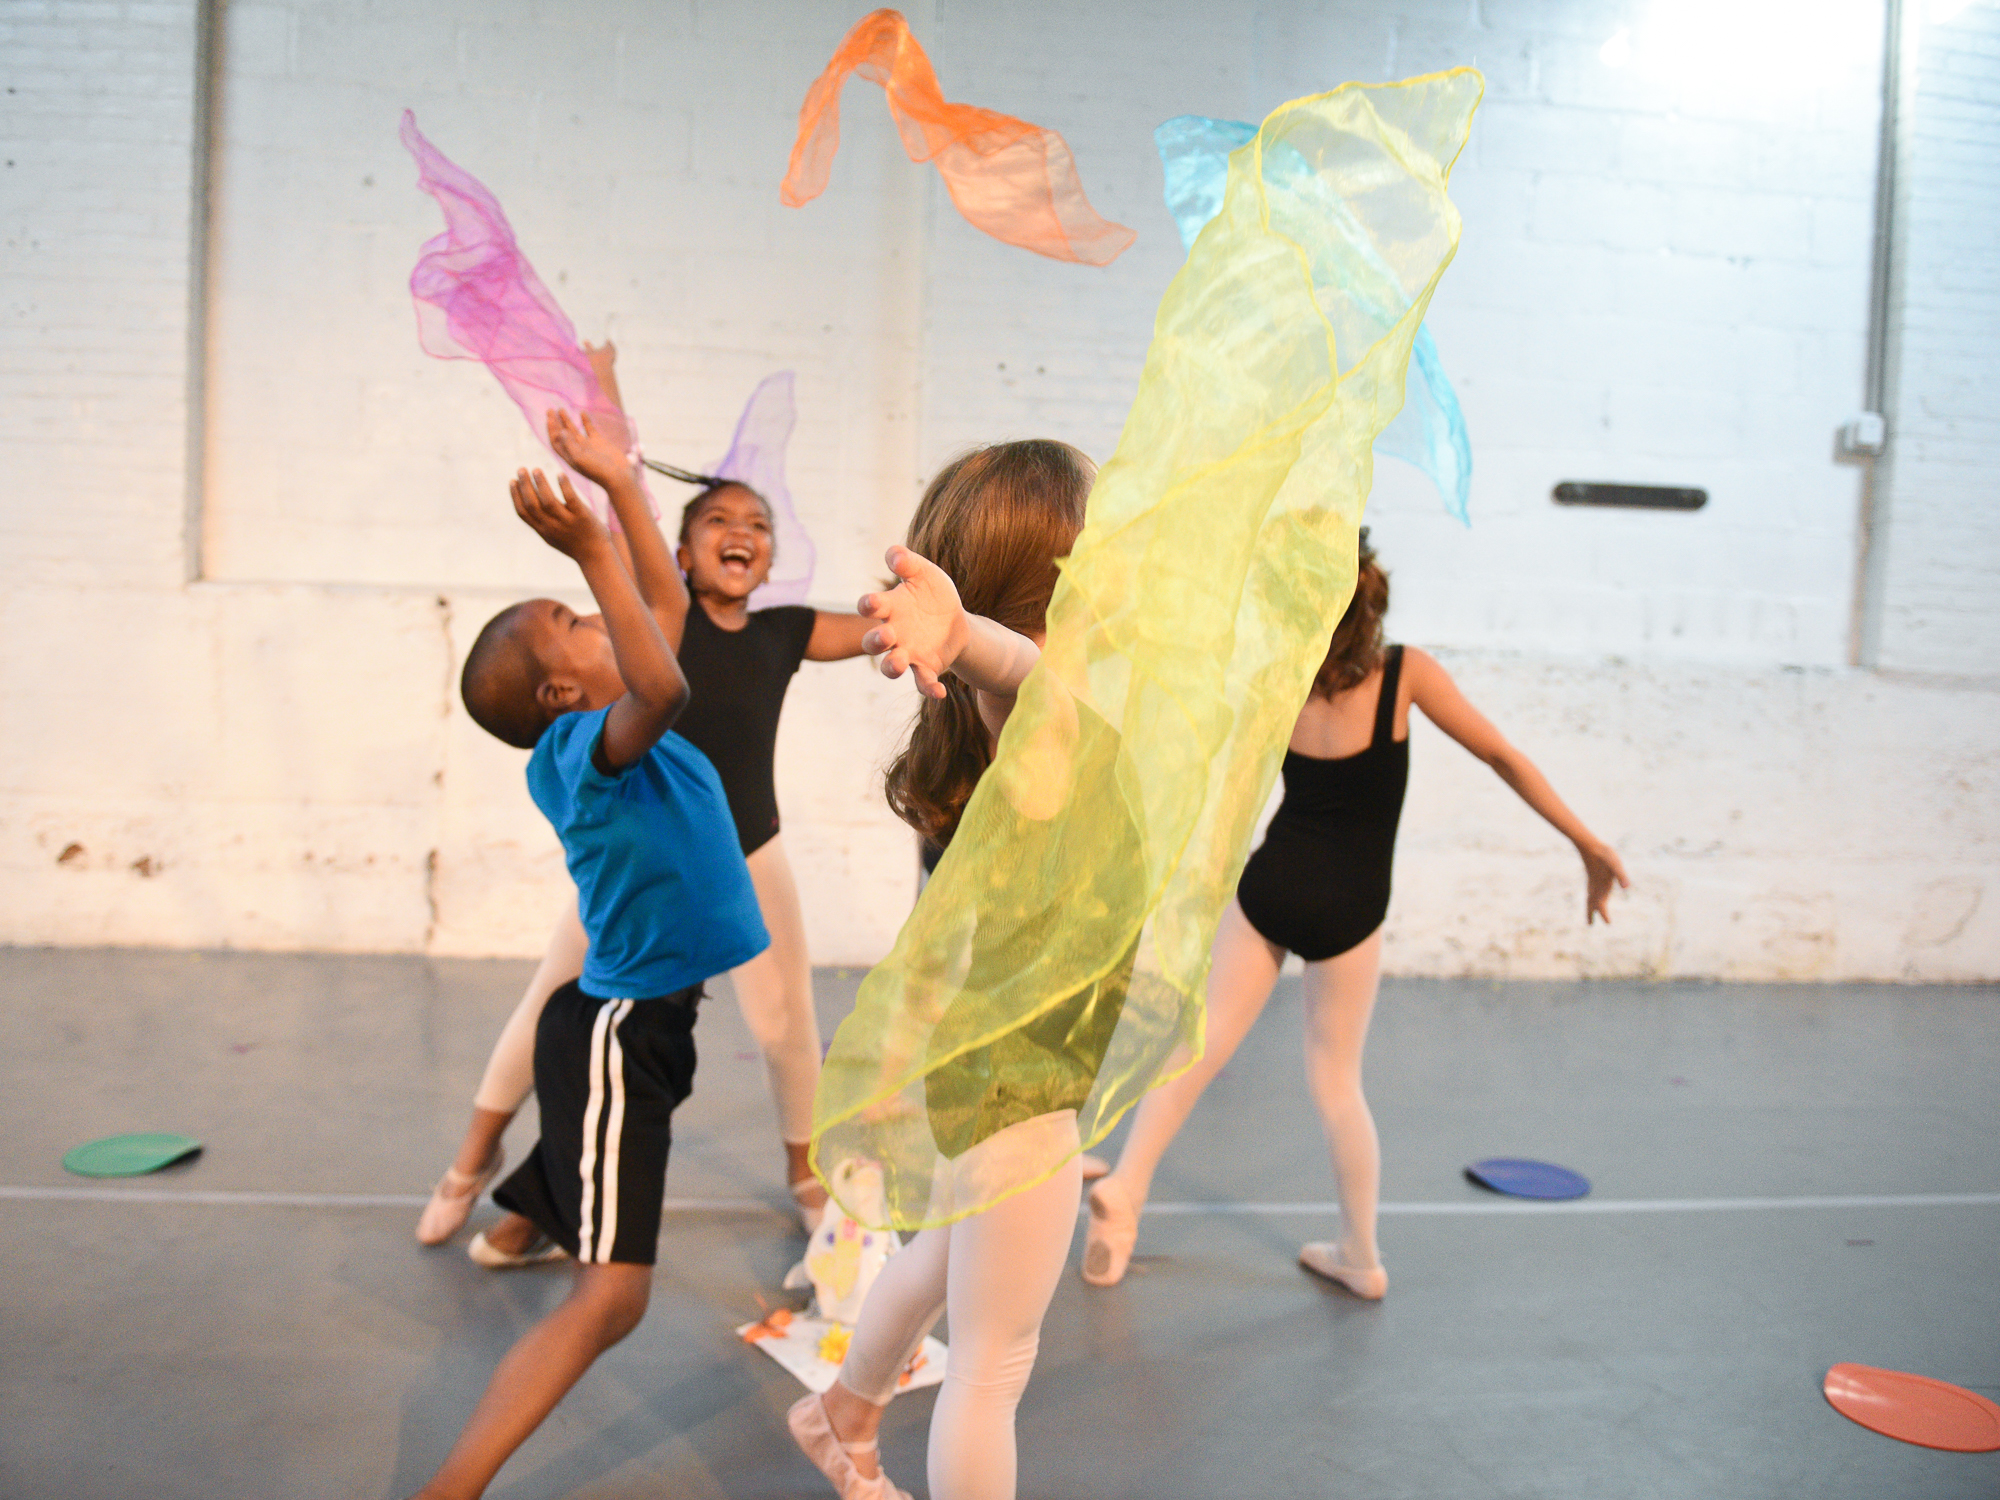 cora-school-for-dance-concert_27436635700_o copy.jpg